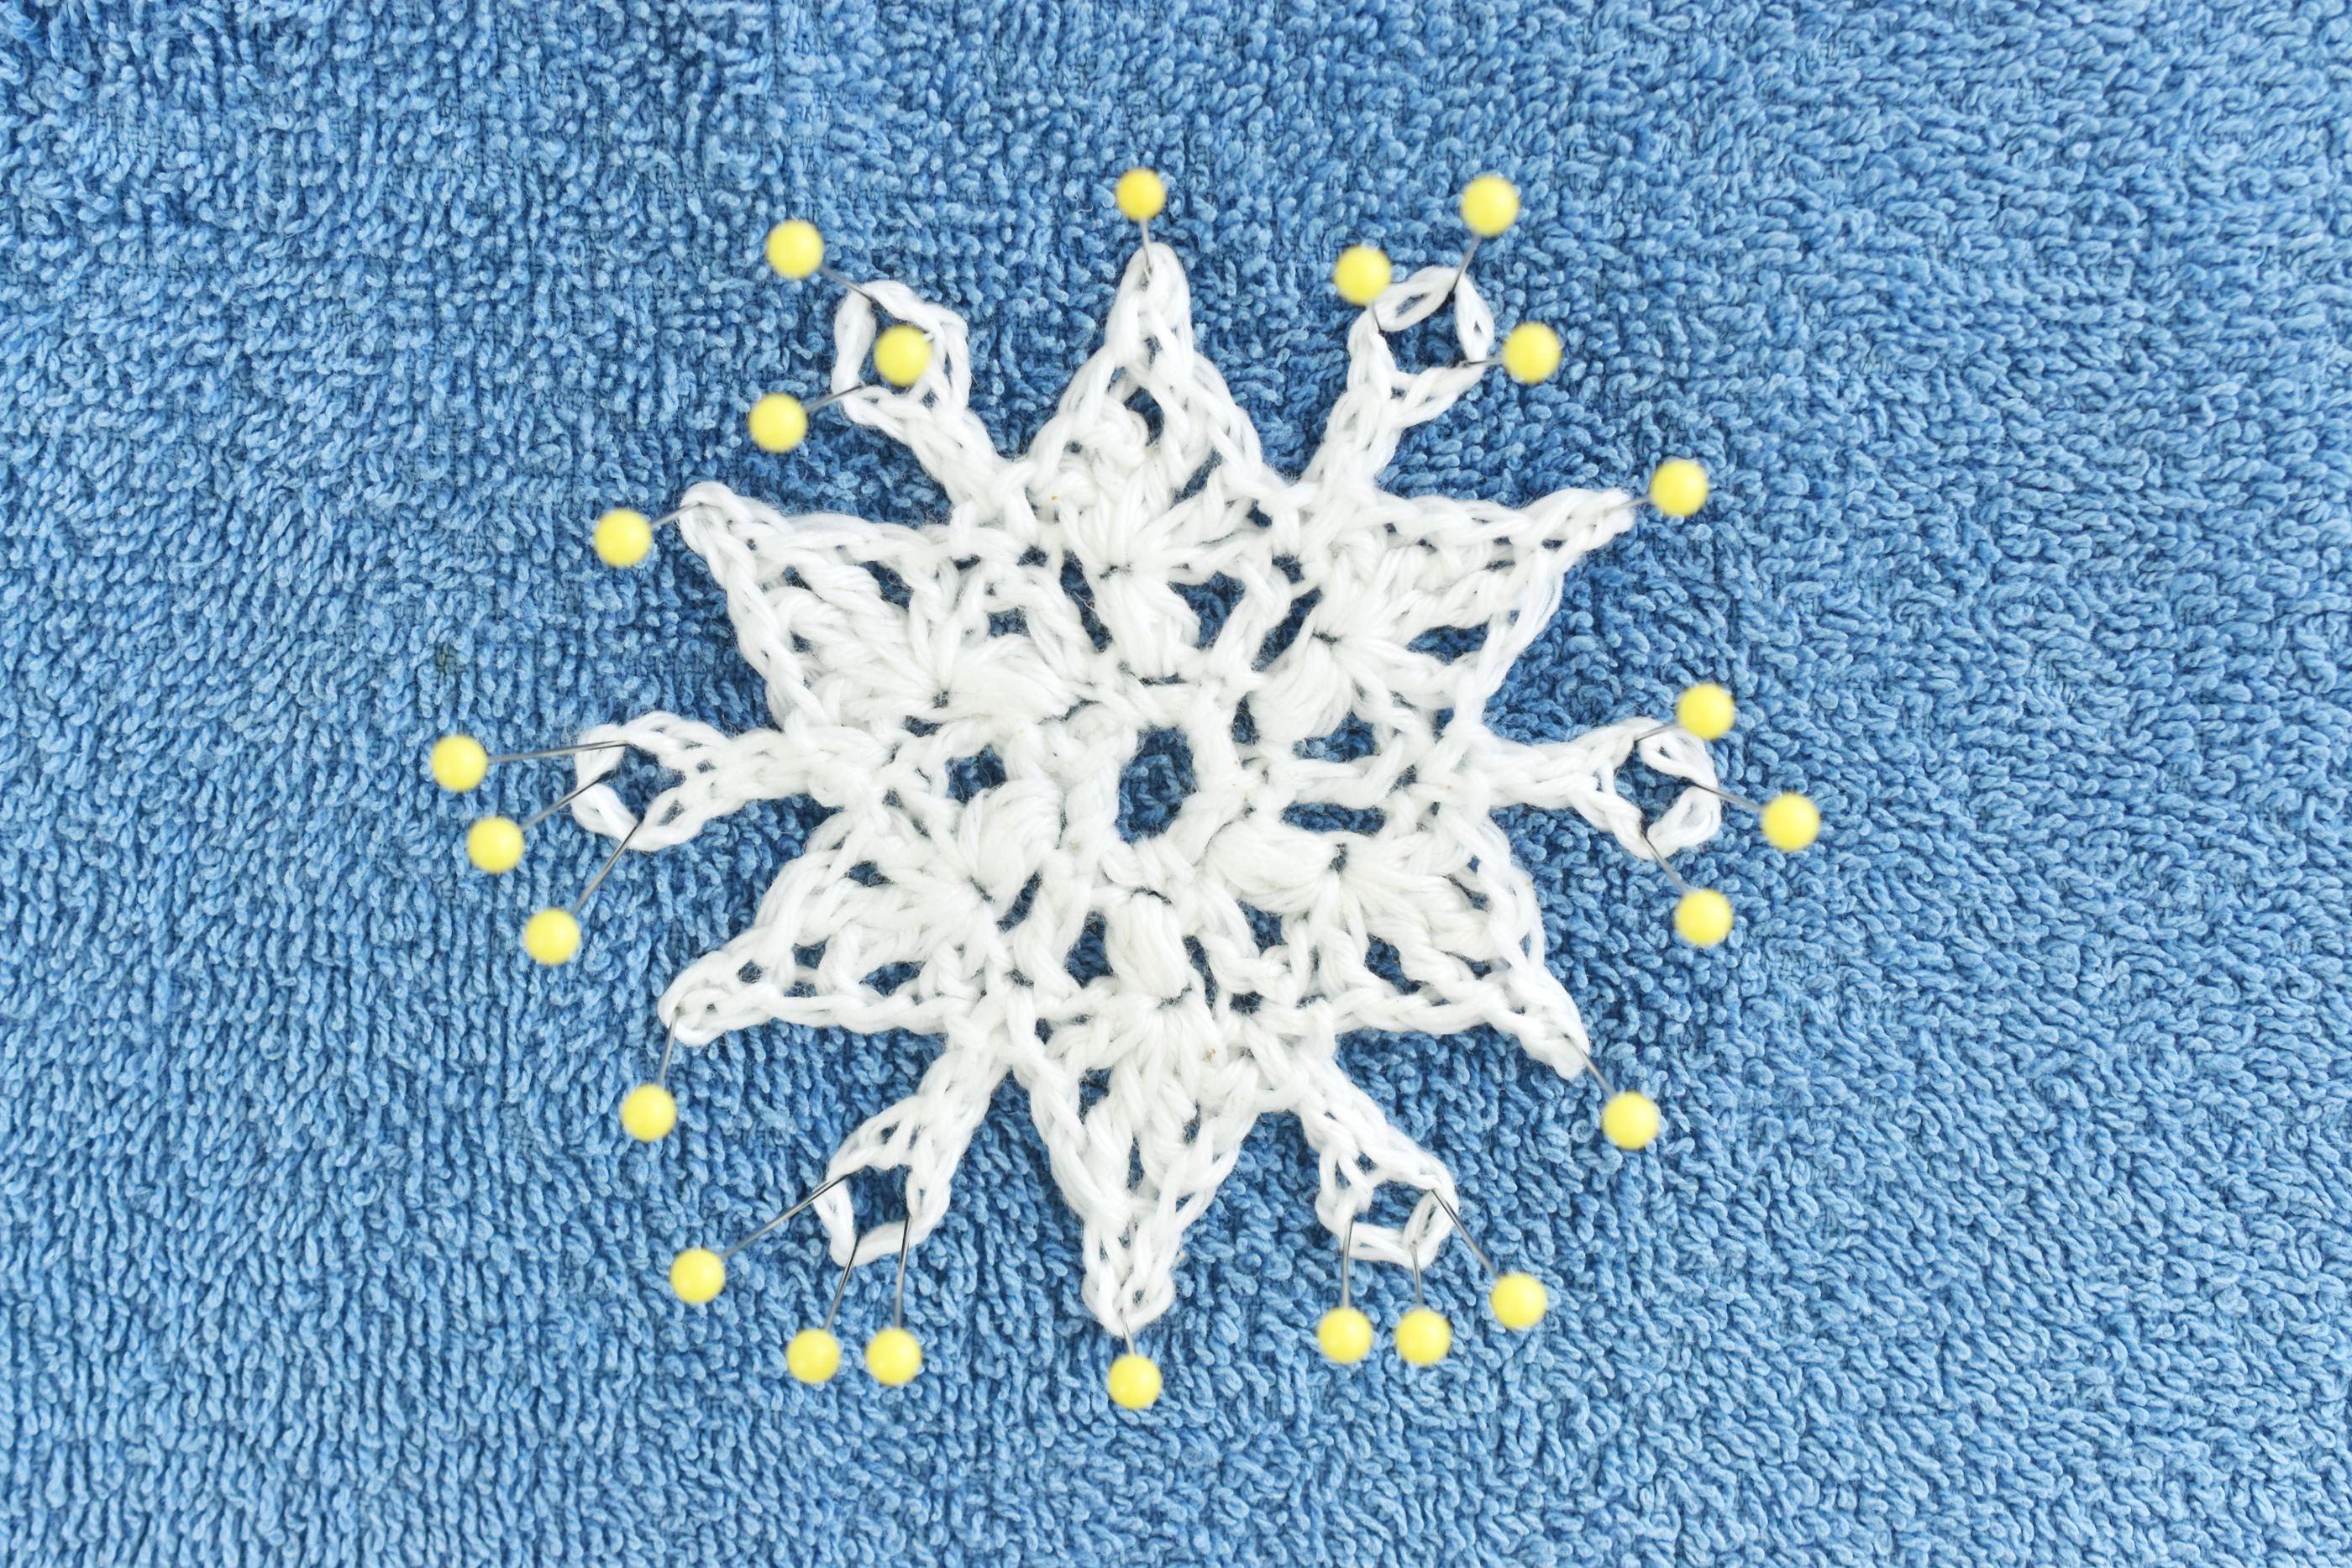 Block the Crocheted Snowflake